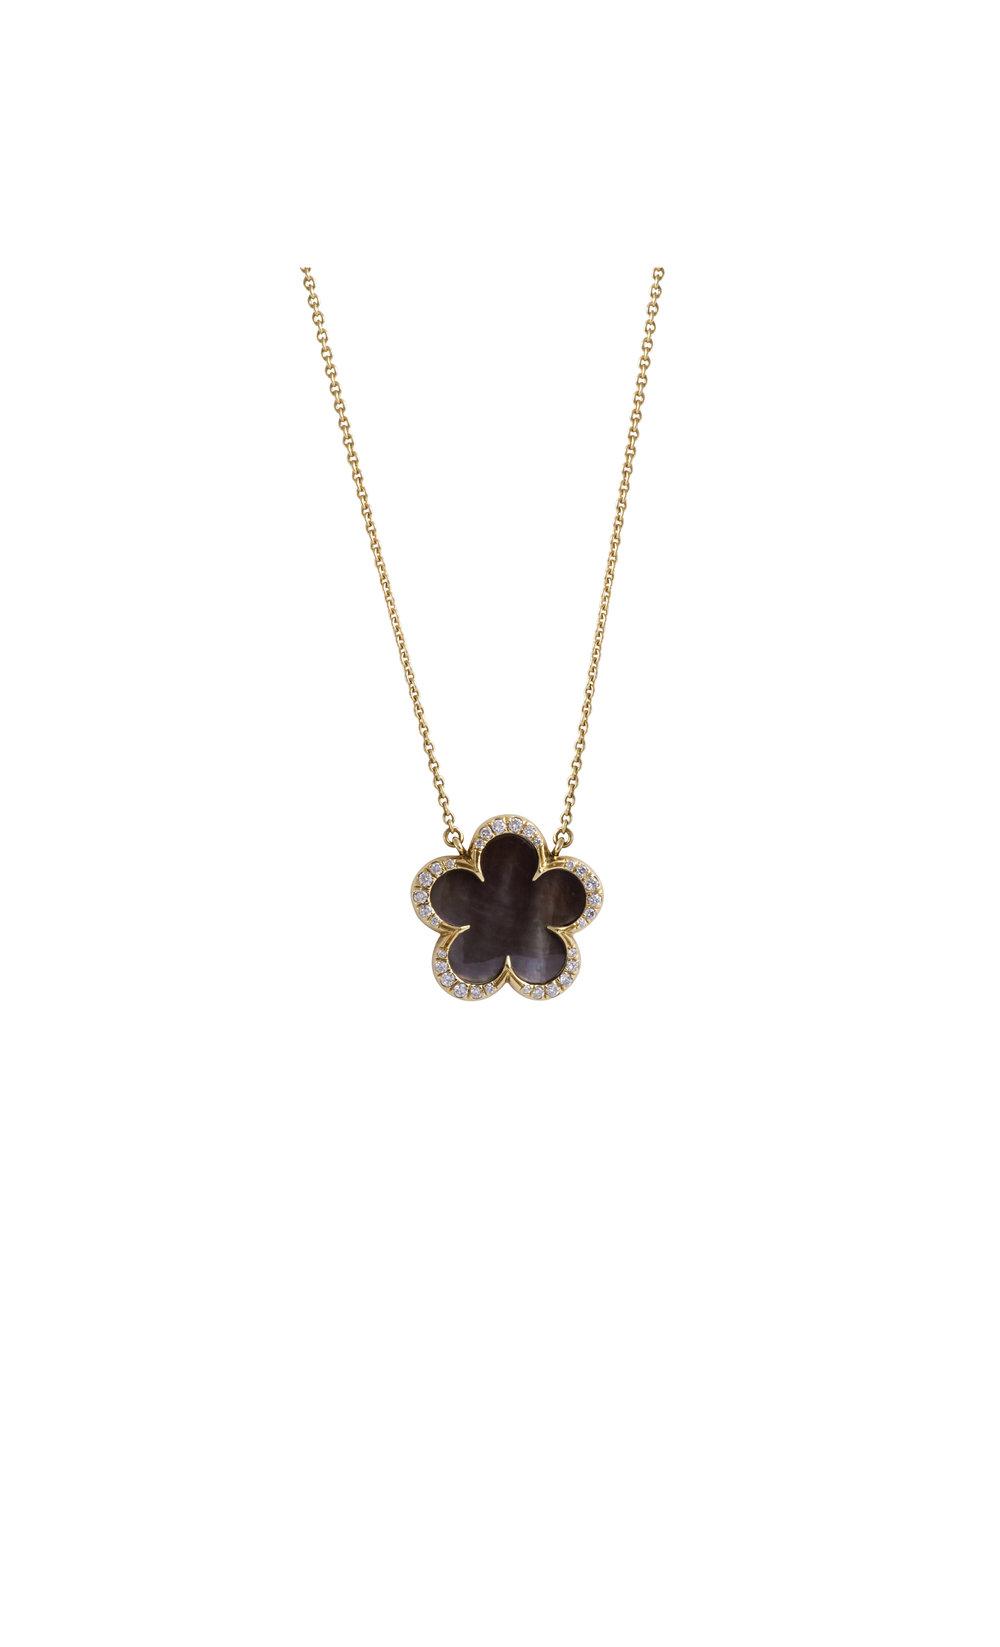 Jewelry by marsha onyx clover pendant necklace onyx clover pendant necklace aloadofball Choice Image